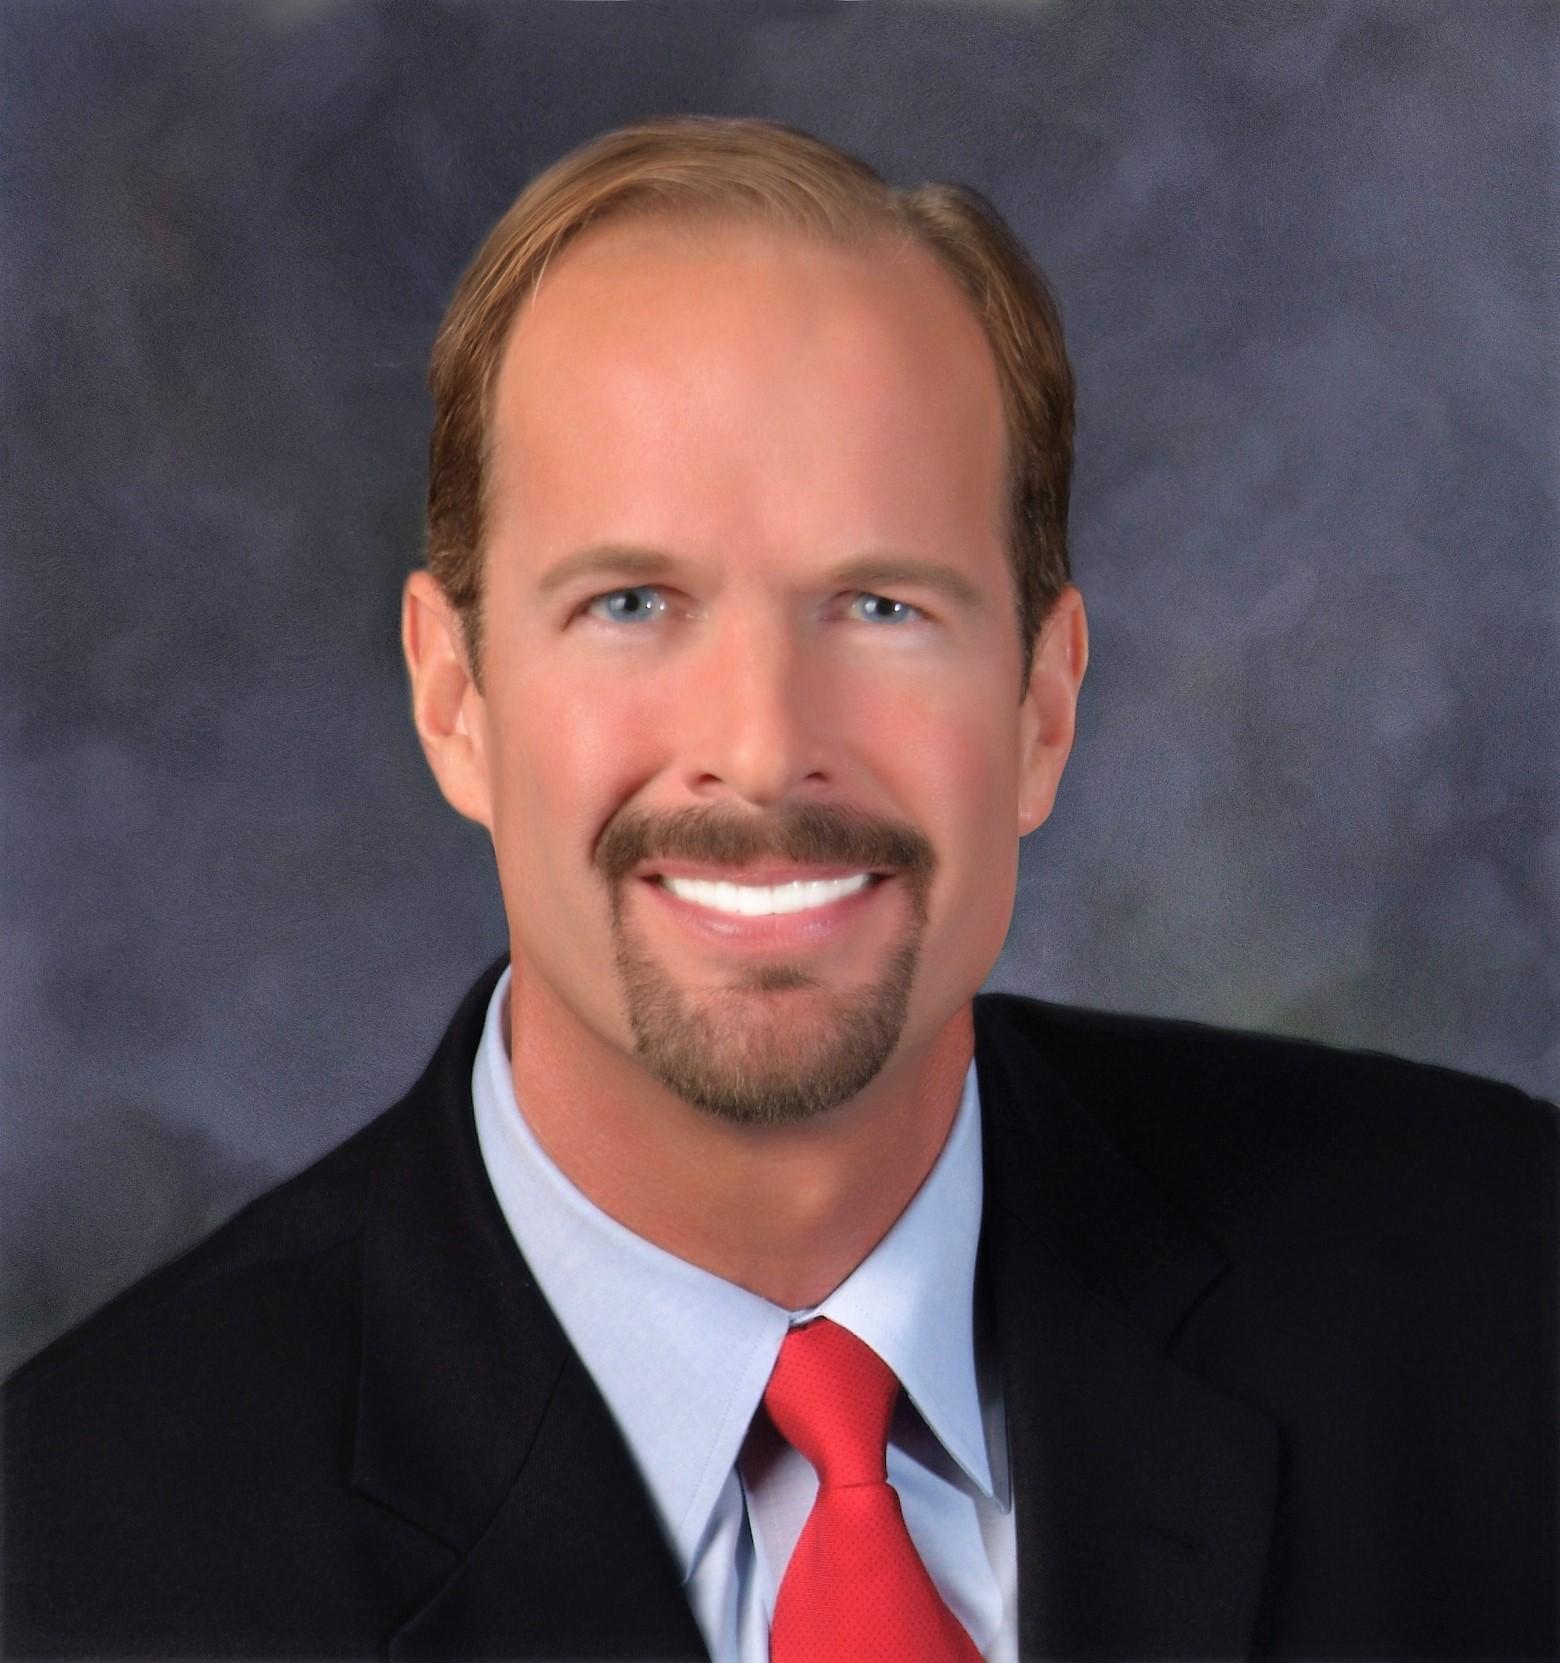 Jeff Rumburg